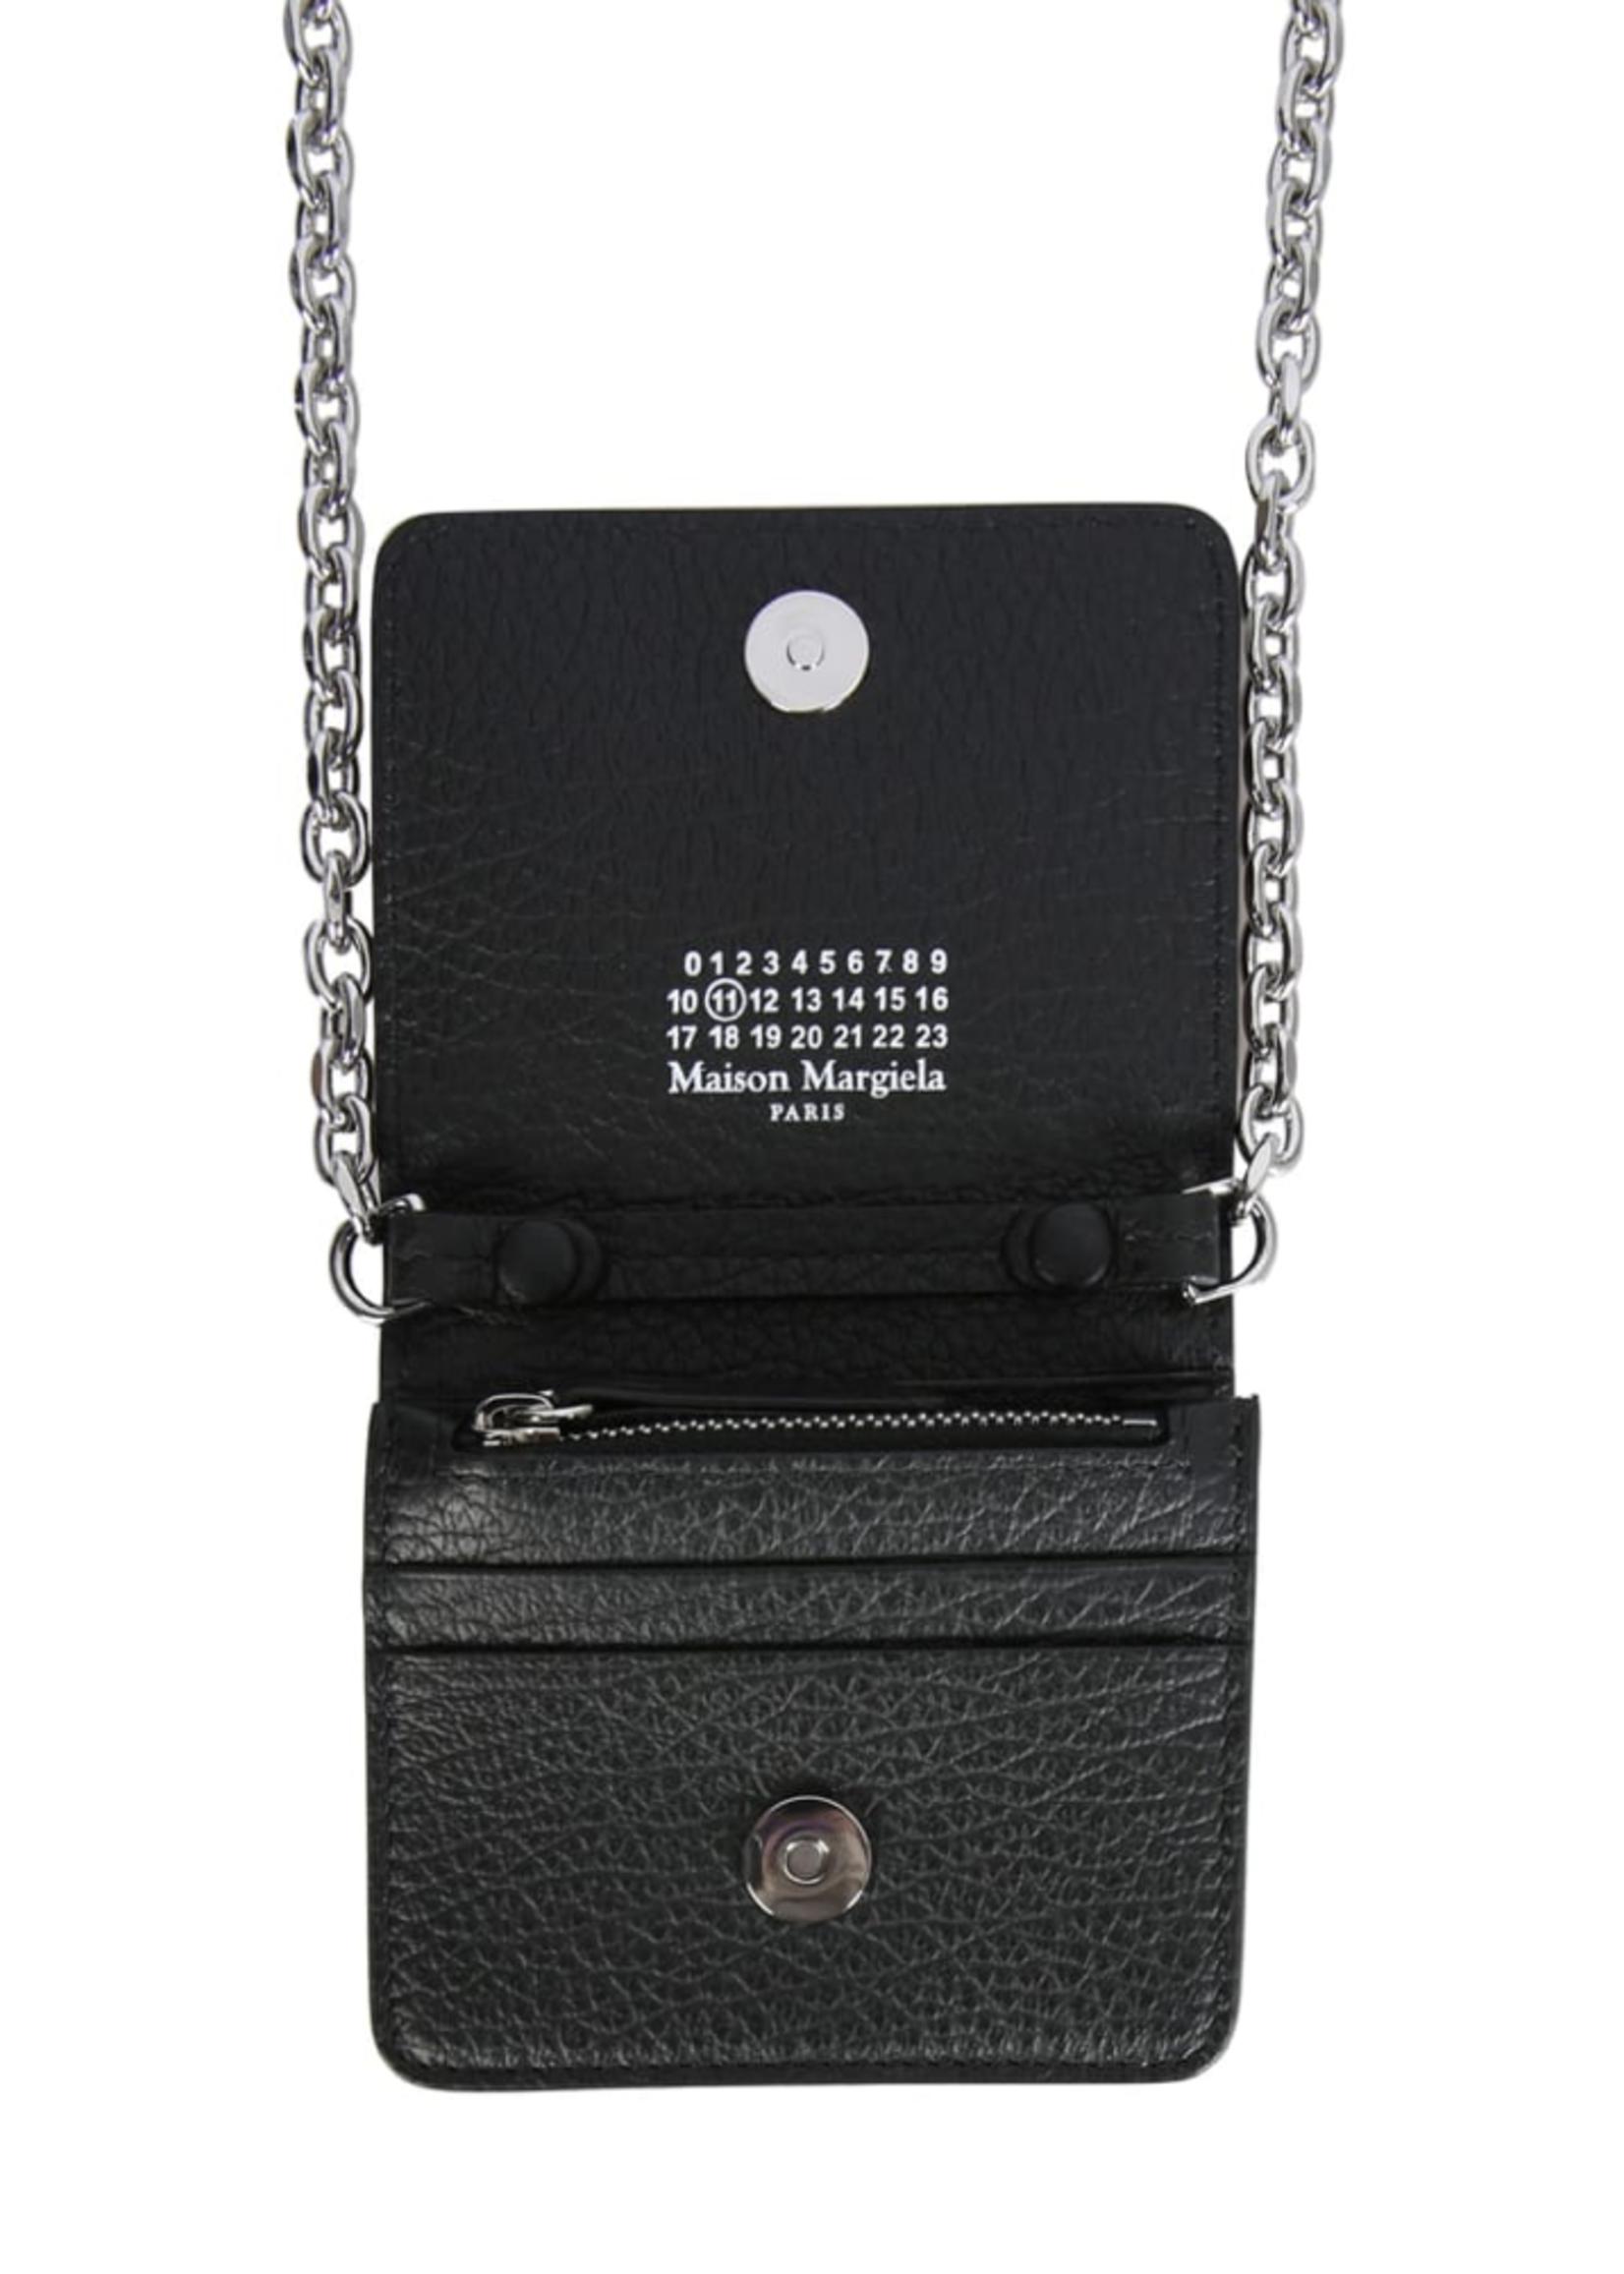 Maison Margiela Small Chain Wallet in Black